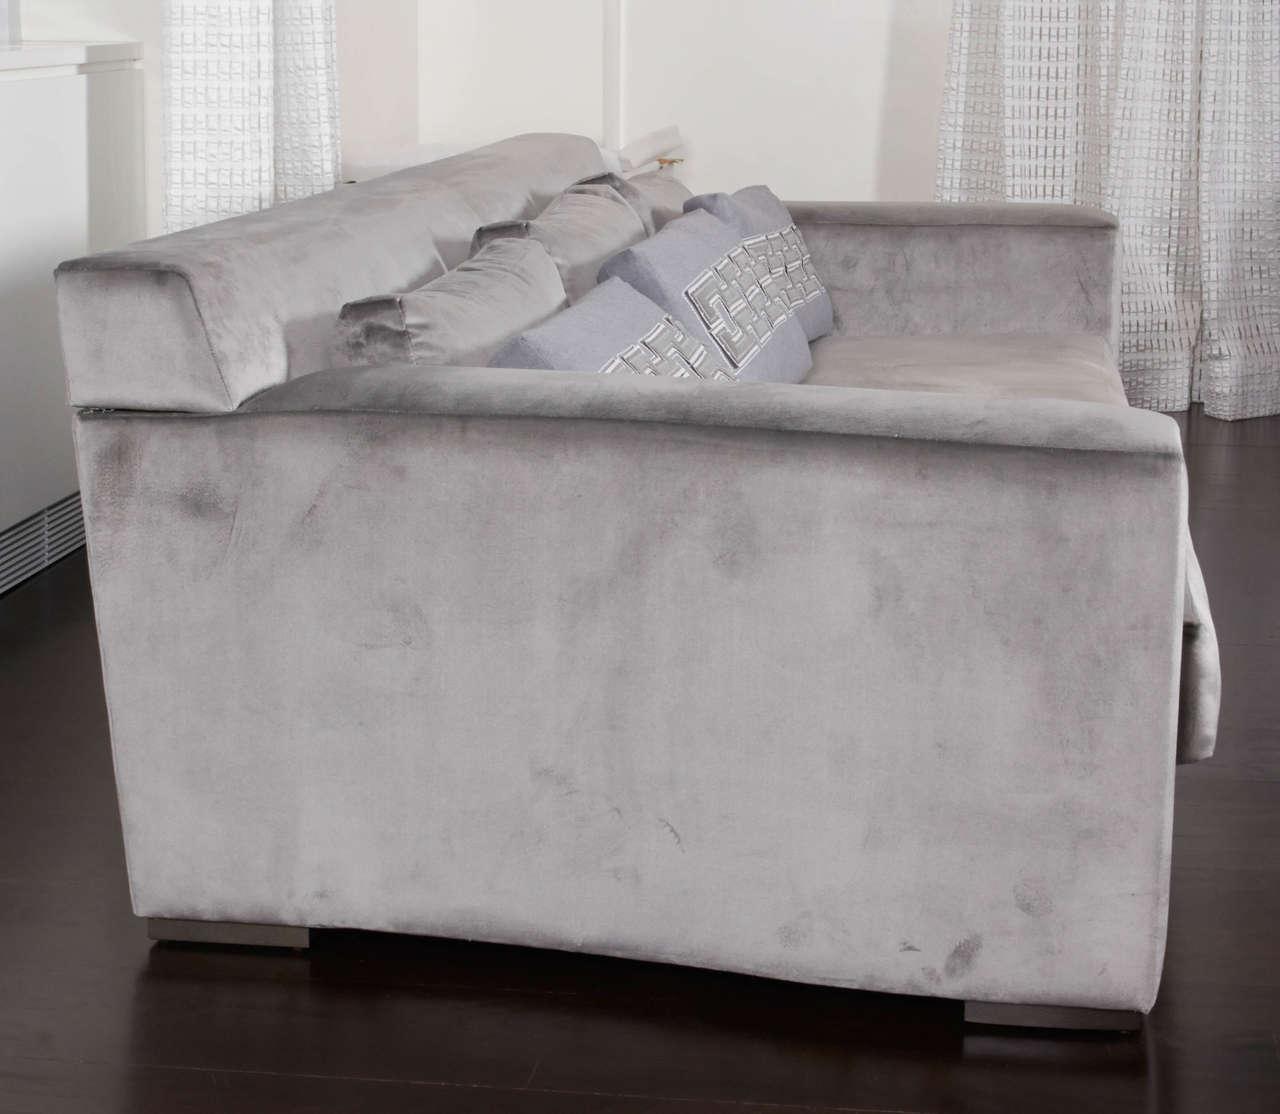 phillipe hurel sofa 39 lila 39 and custom applique pillows for sale at 1stdibs. Black Bedroom Furniture Sets. Home Design Ideas